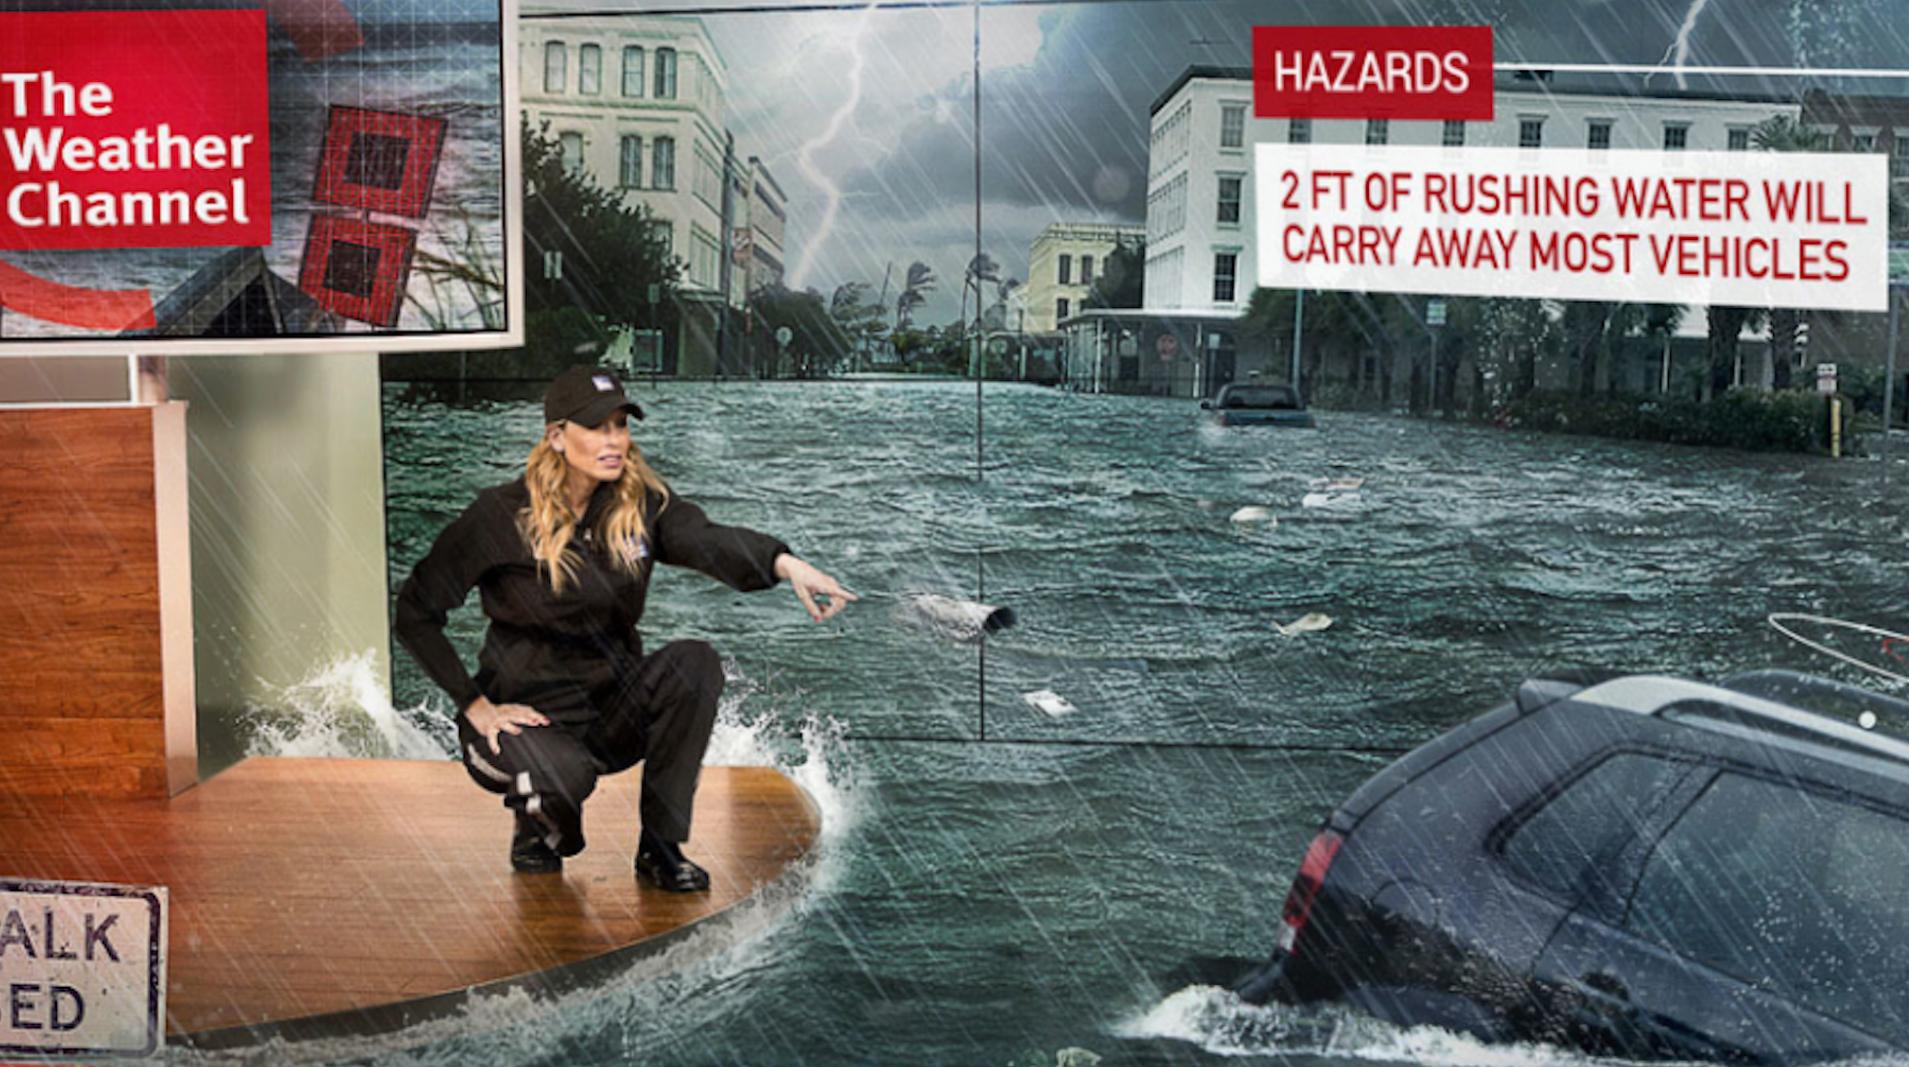 réalité augmentée - météo